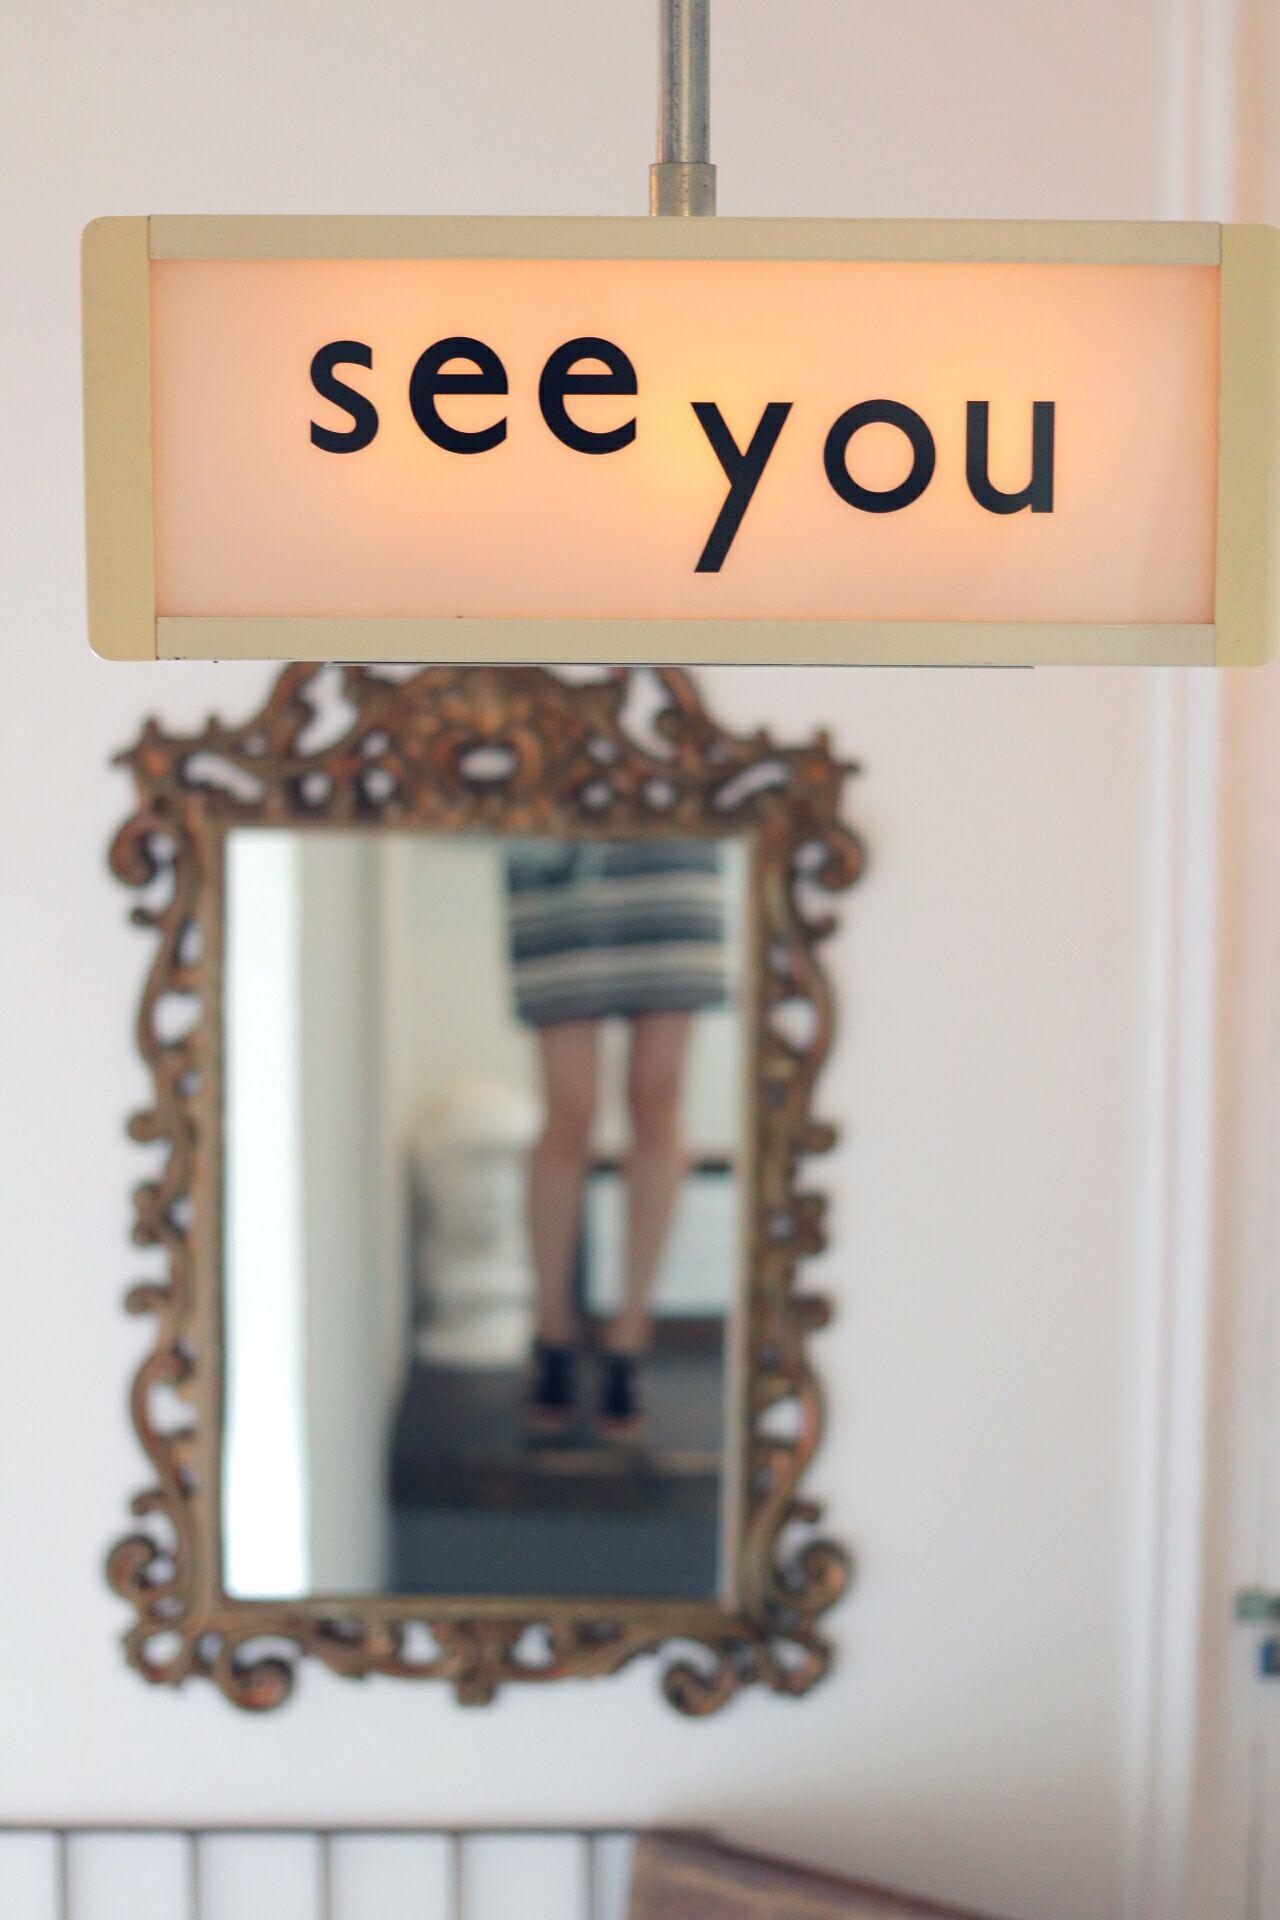 Close-up Indoors  Day Mirrorselfie Mirror Picture Seeyou Canon カメラ女子 ファインダー越しの私の世界 写真撮ってる人と繋がりたい カメラ好きな人と繋がりたい EyeEmNewHere